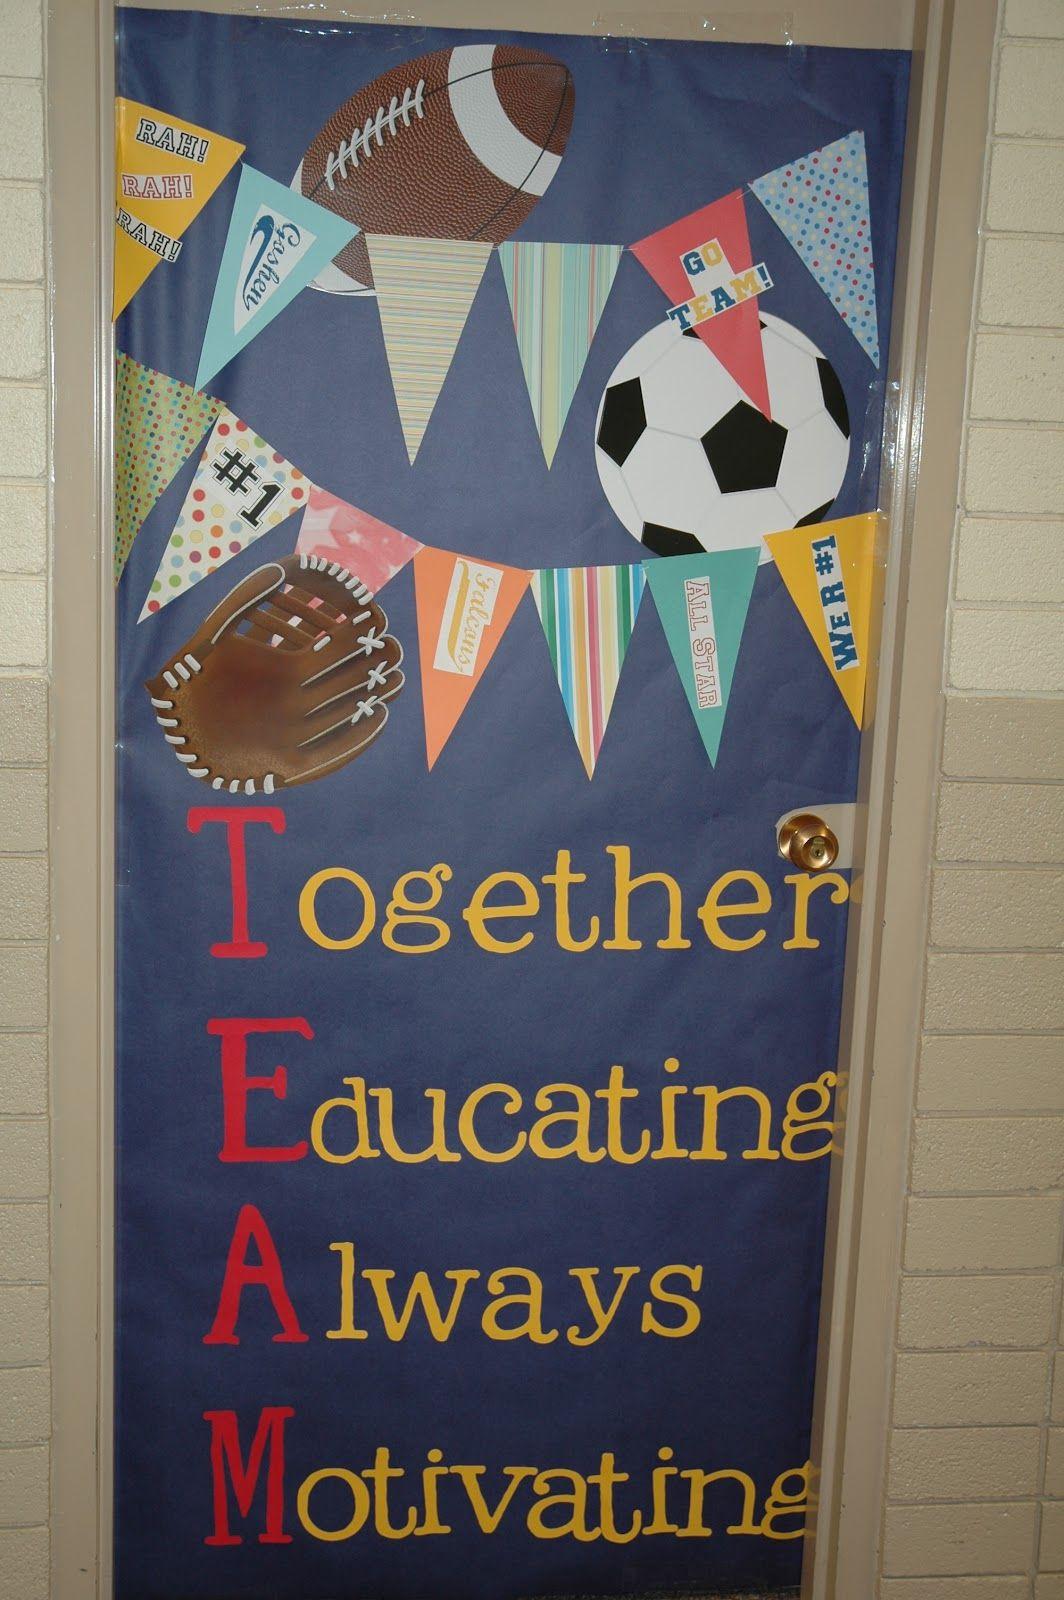 Teacher Appreciation Door Decorating Ideas | Room mom ...